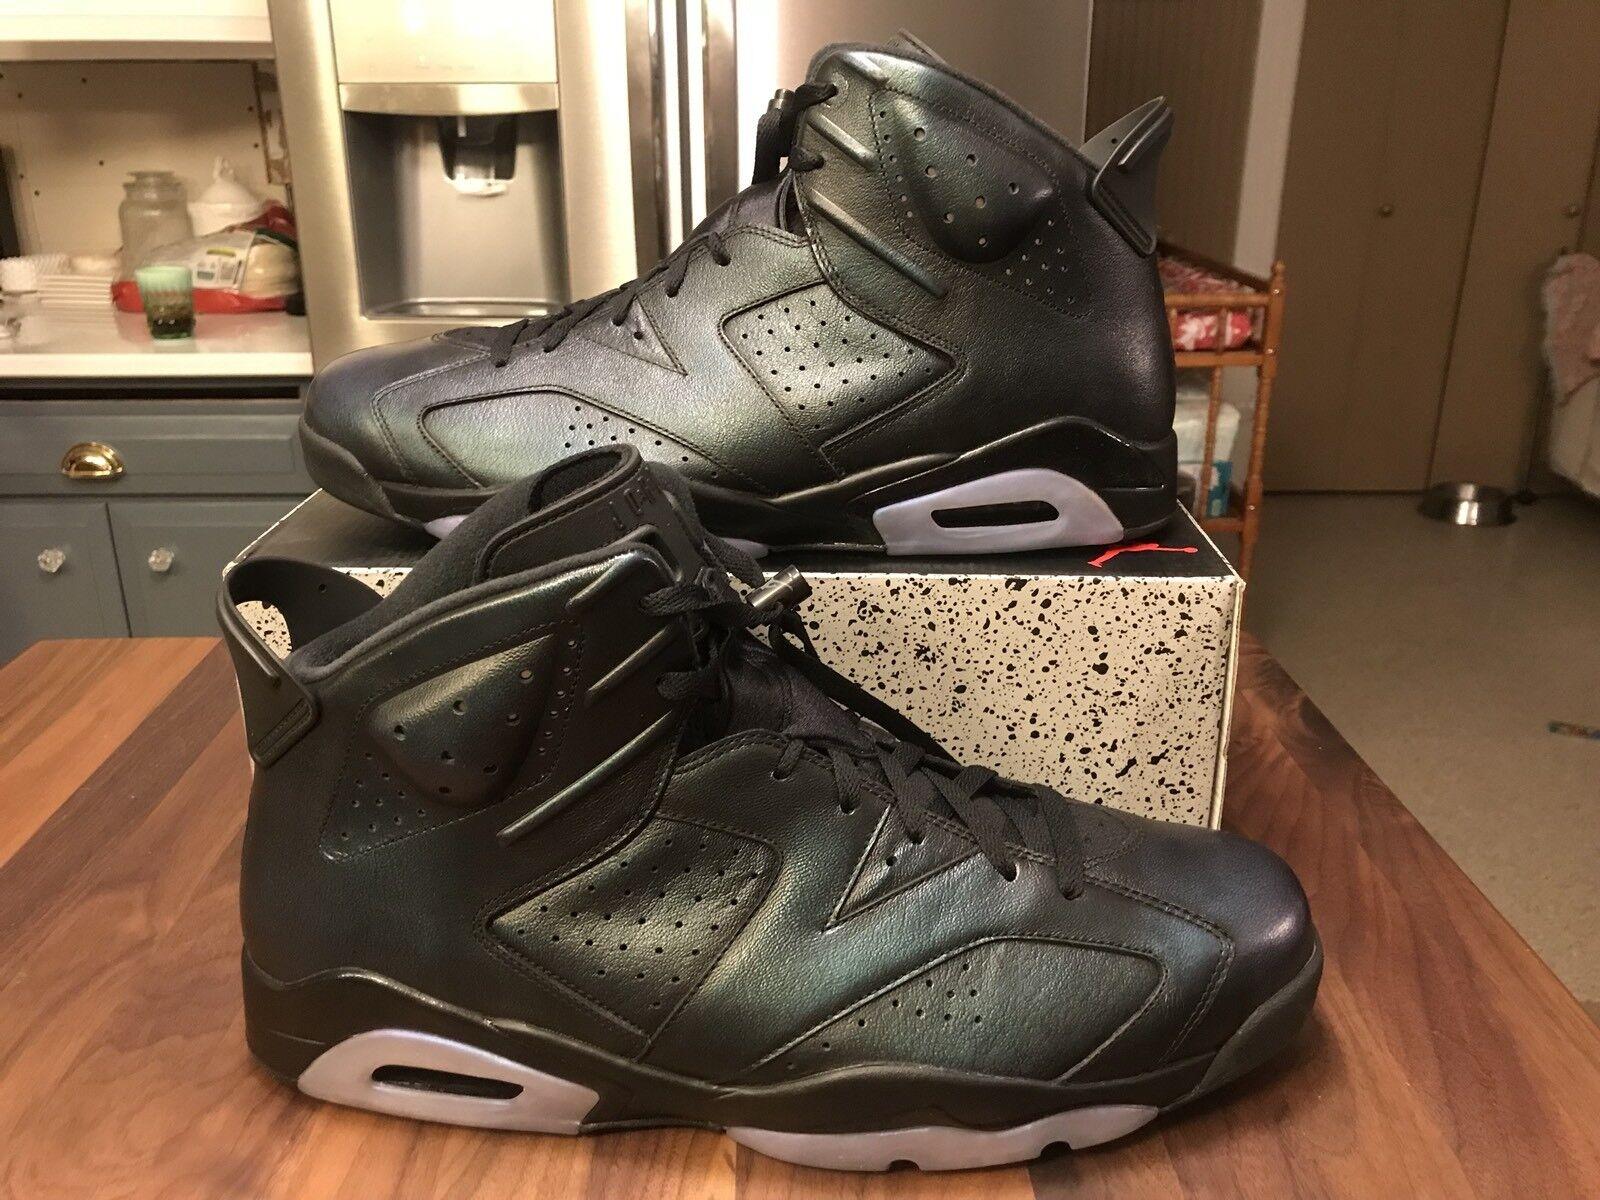 Nike Air Jordan 6 Retro Chameleon 907961 015 Size 18   NIB!!! - FREE SHIPPING!!!